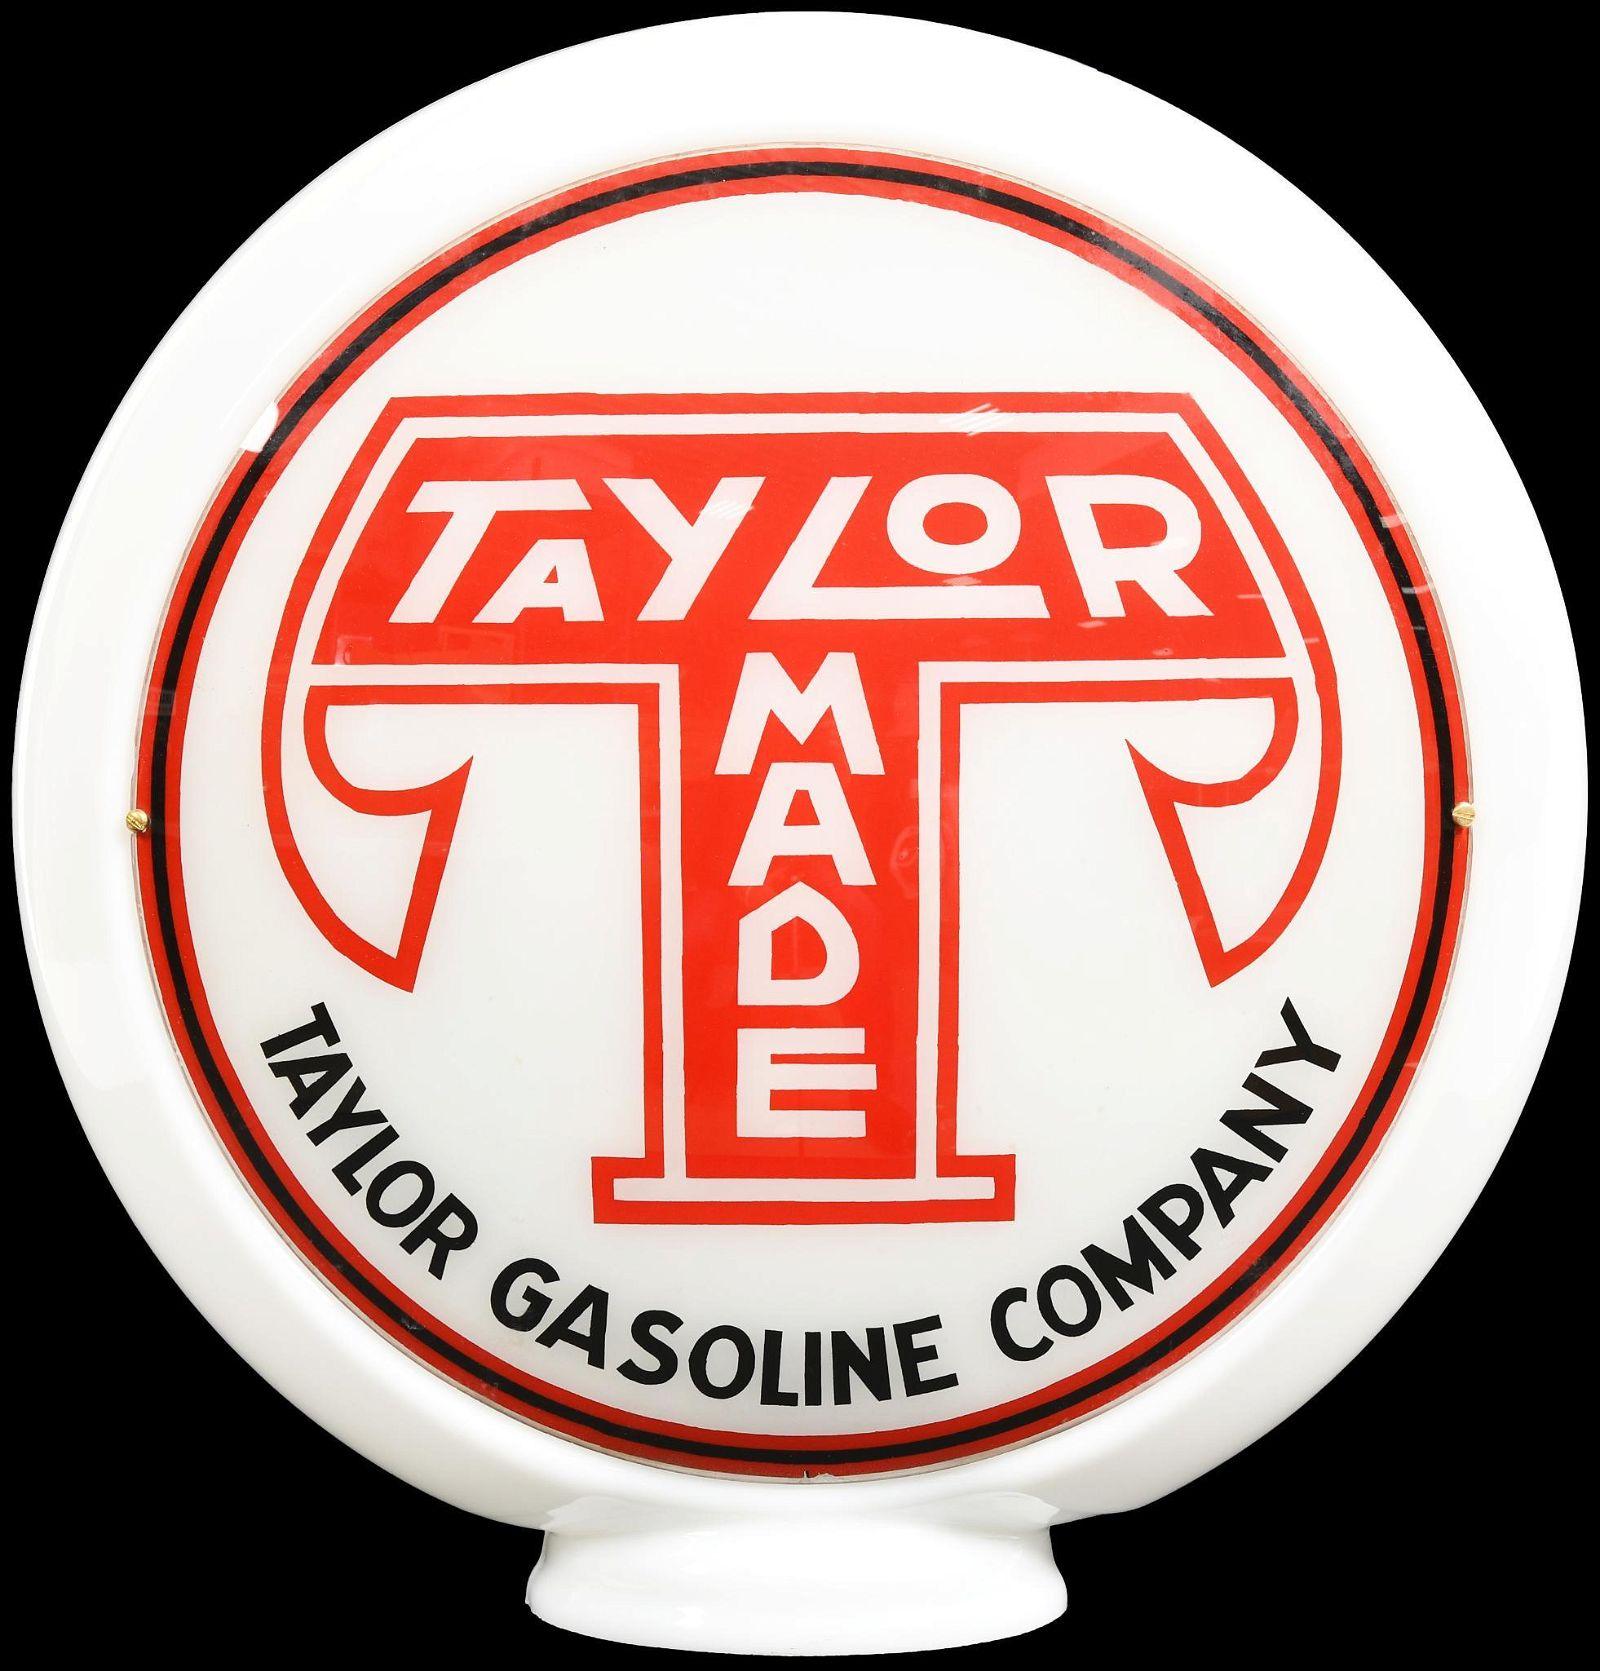 Taylor Made Globe